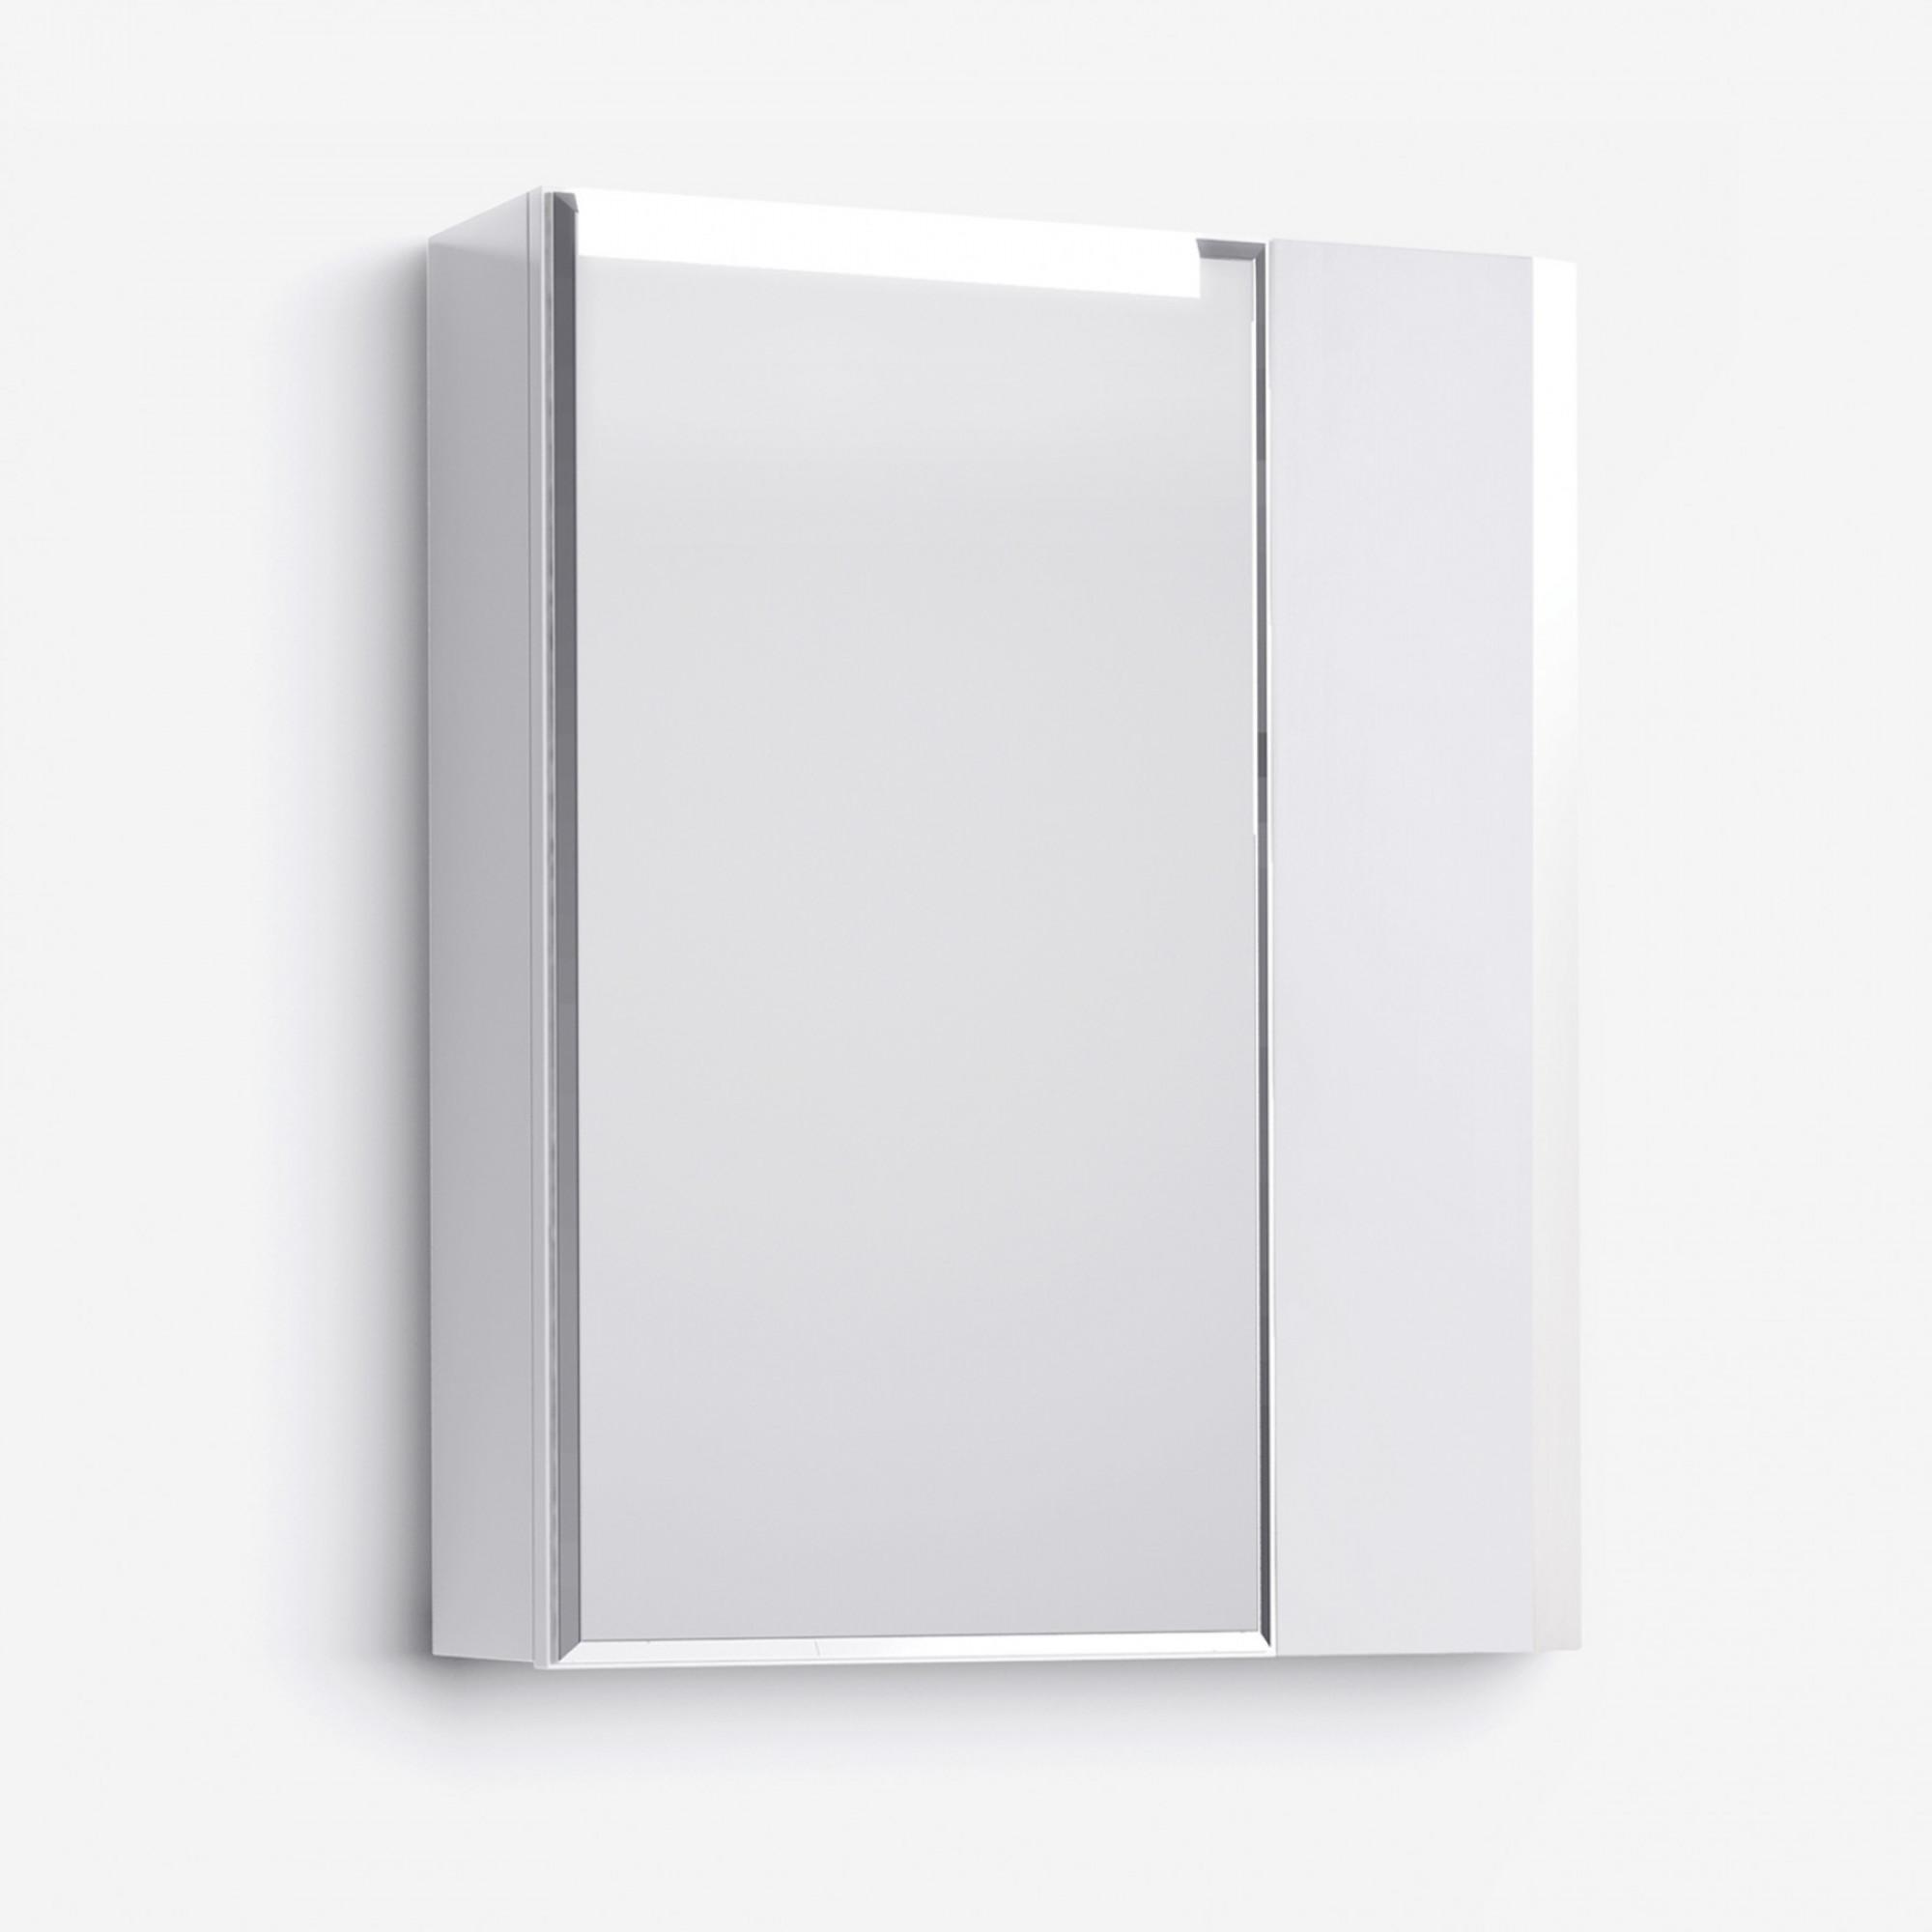 Шкаф зеркальный Latte 60 белый +7 700 руб.